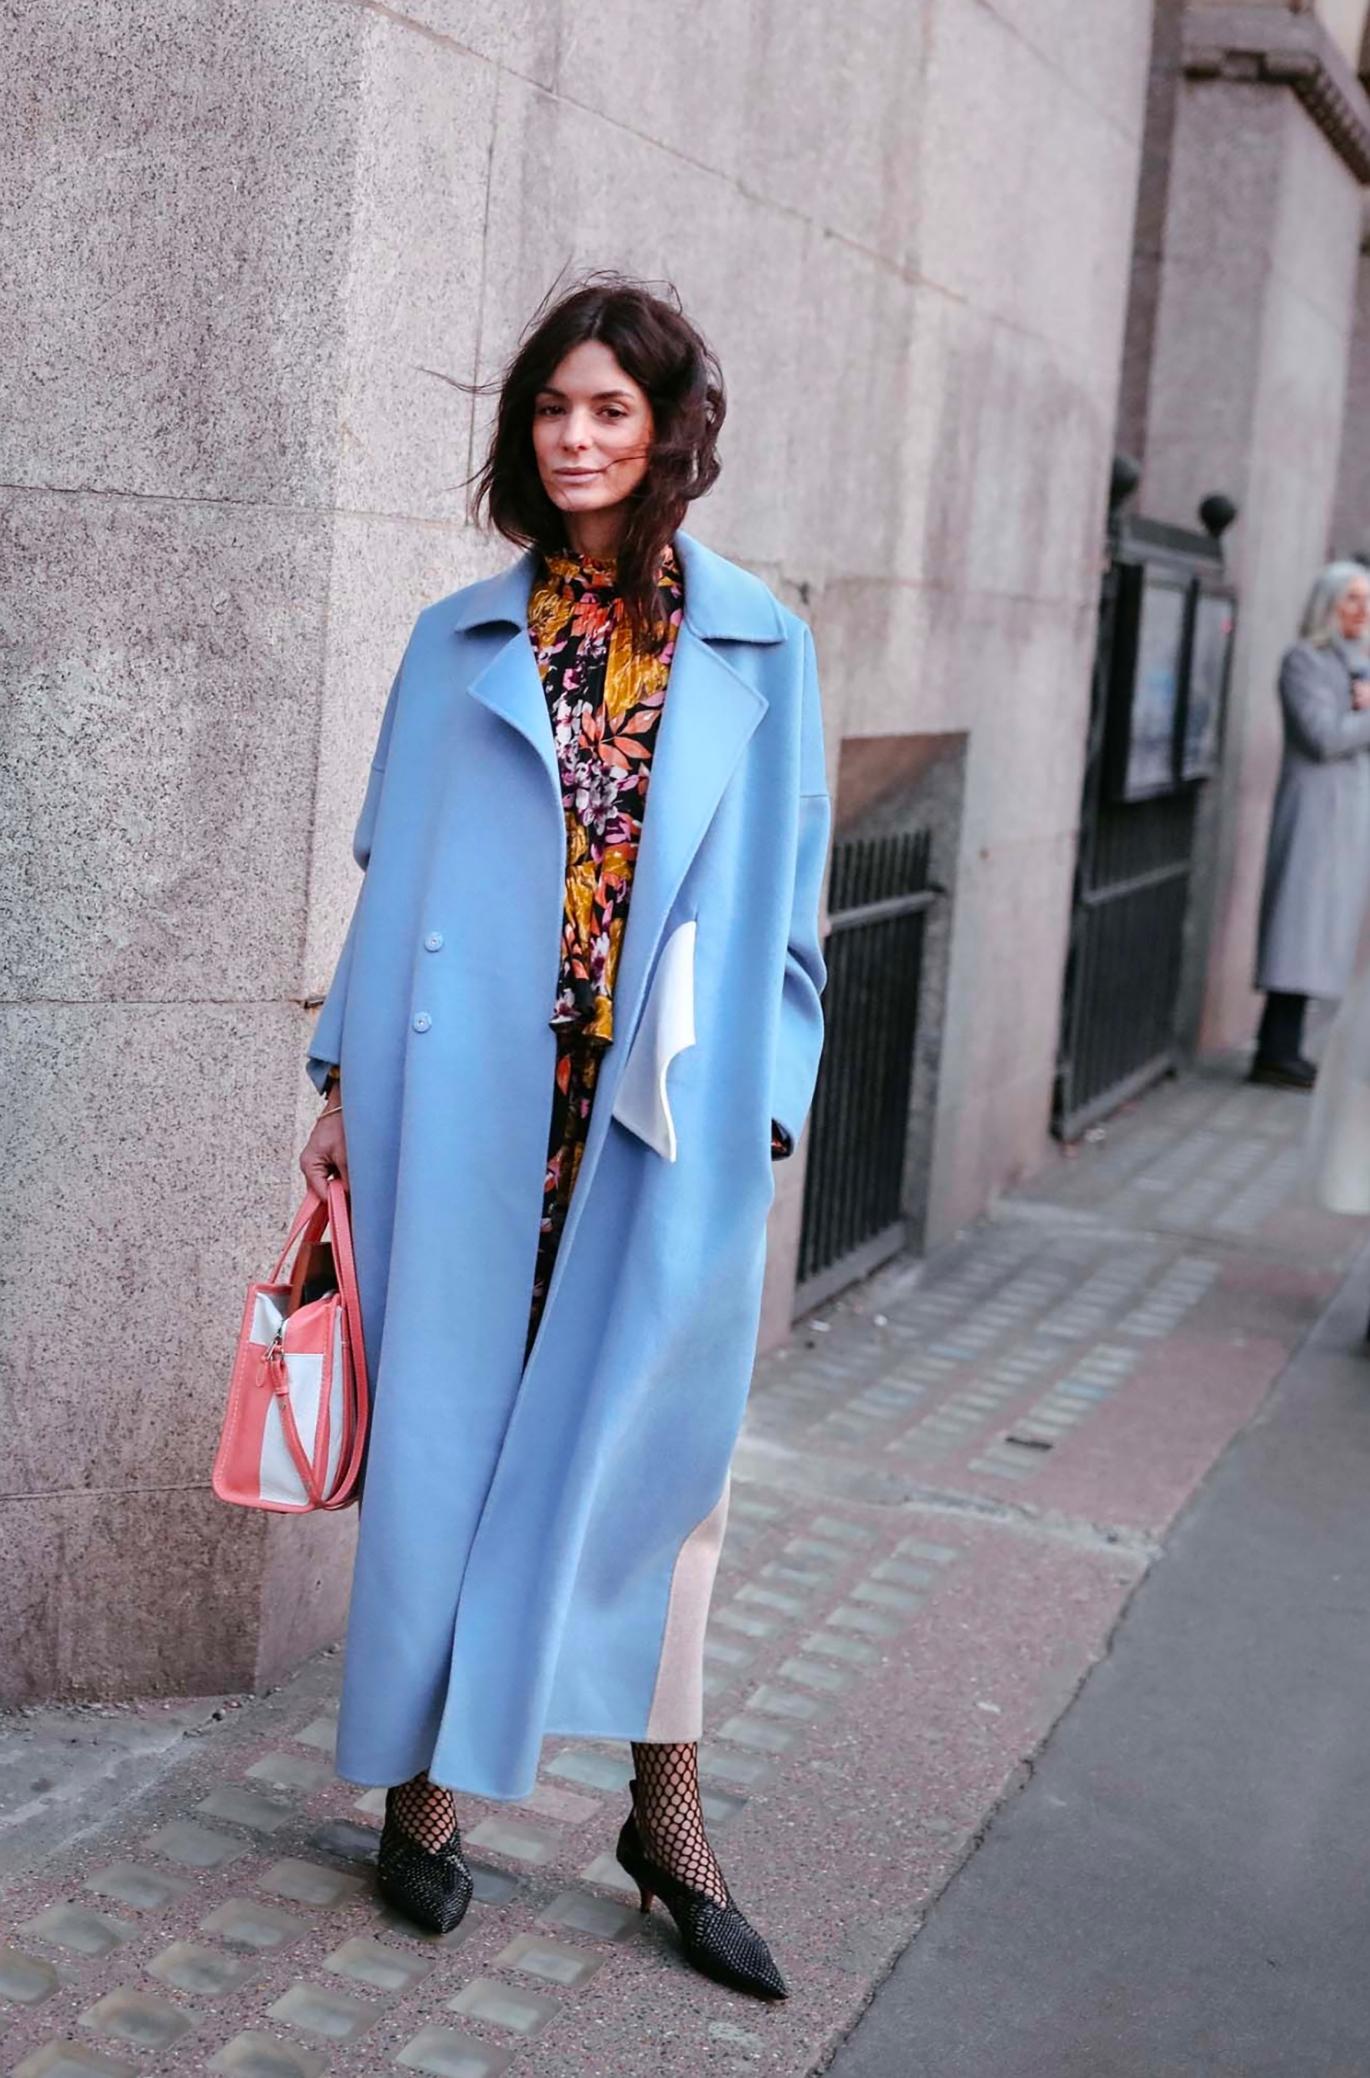 London Fashion Week Street Style As Seen On Beeswonderland